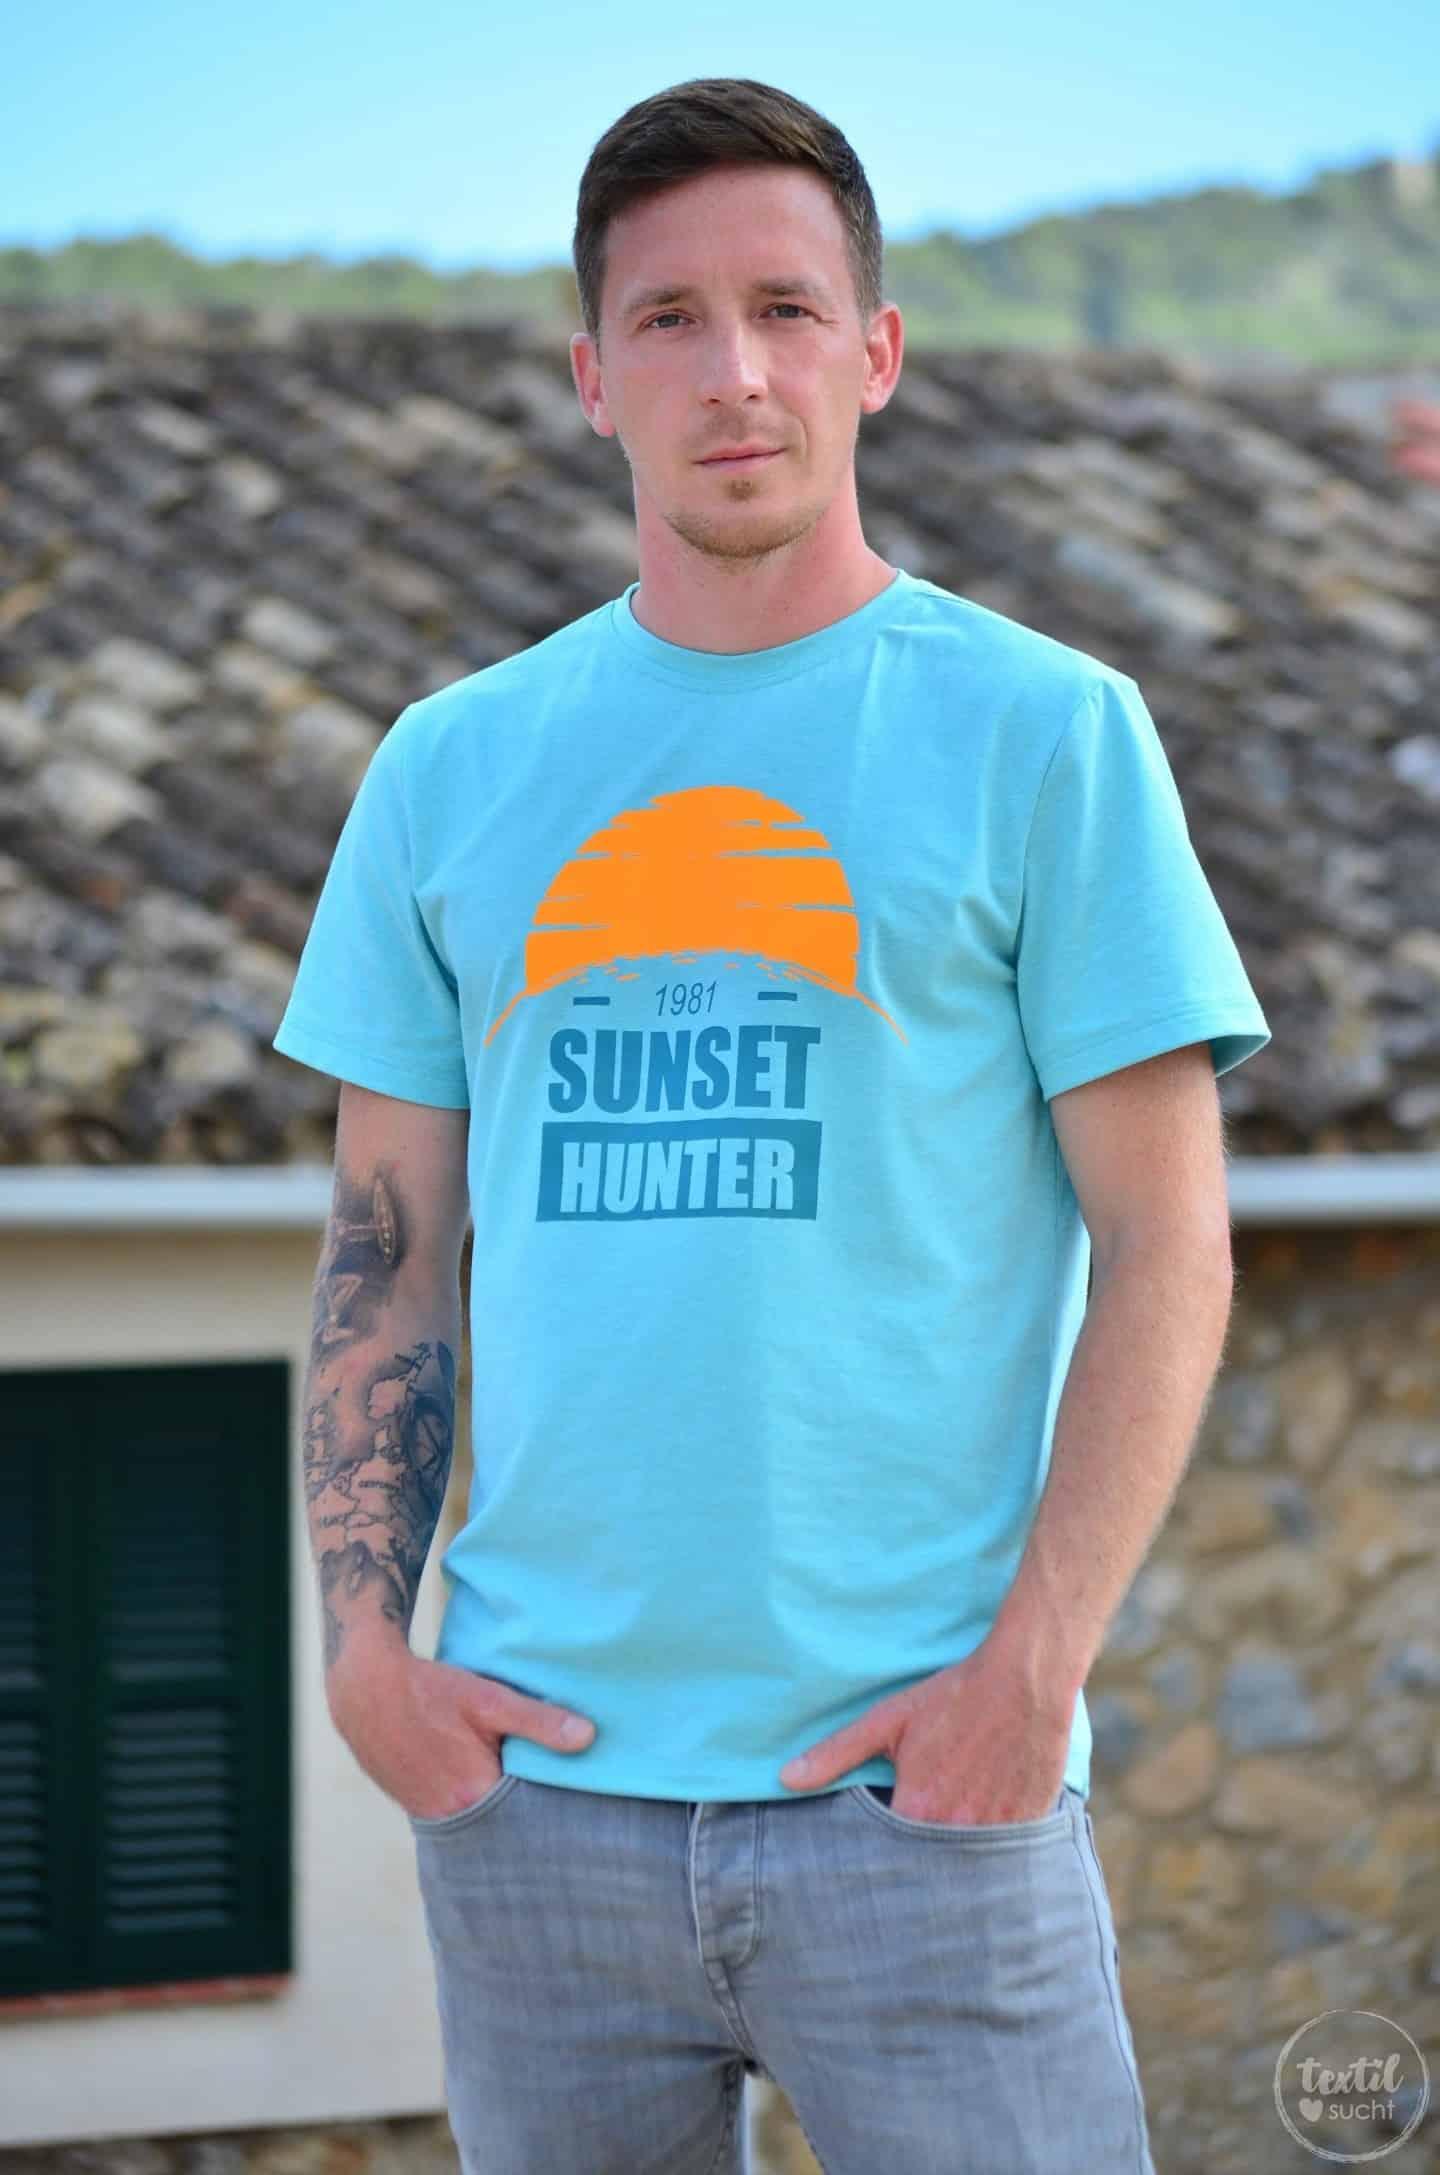 Nähen für den Sommer: Schnittmuster Shirt Rio & Plottervorlage Sunset Hunter | textilsucht.de